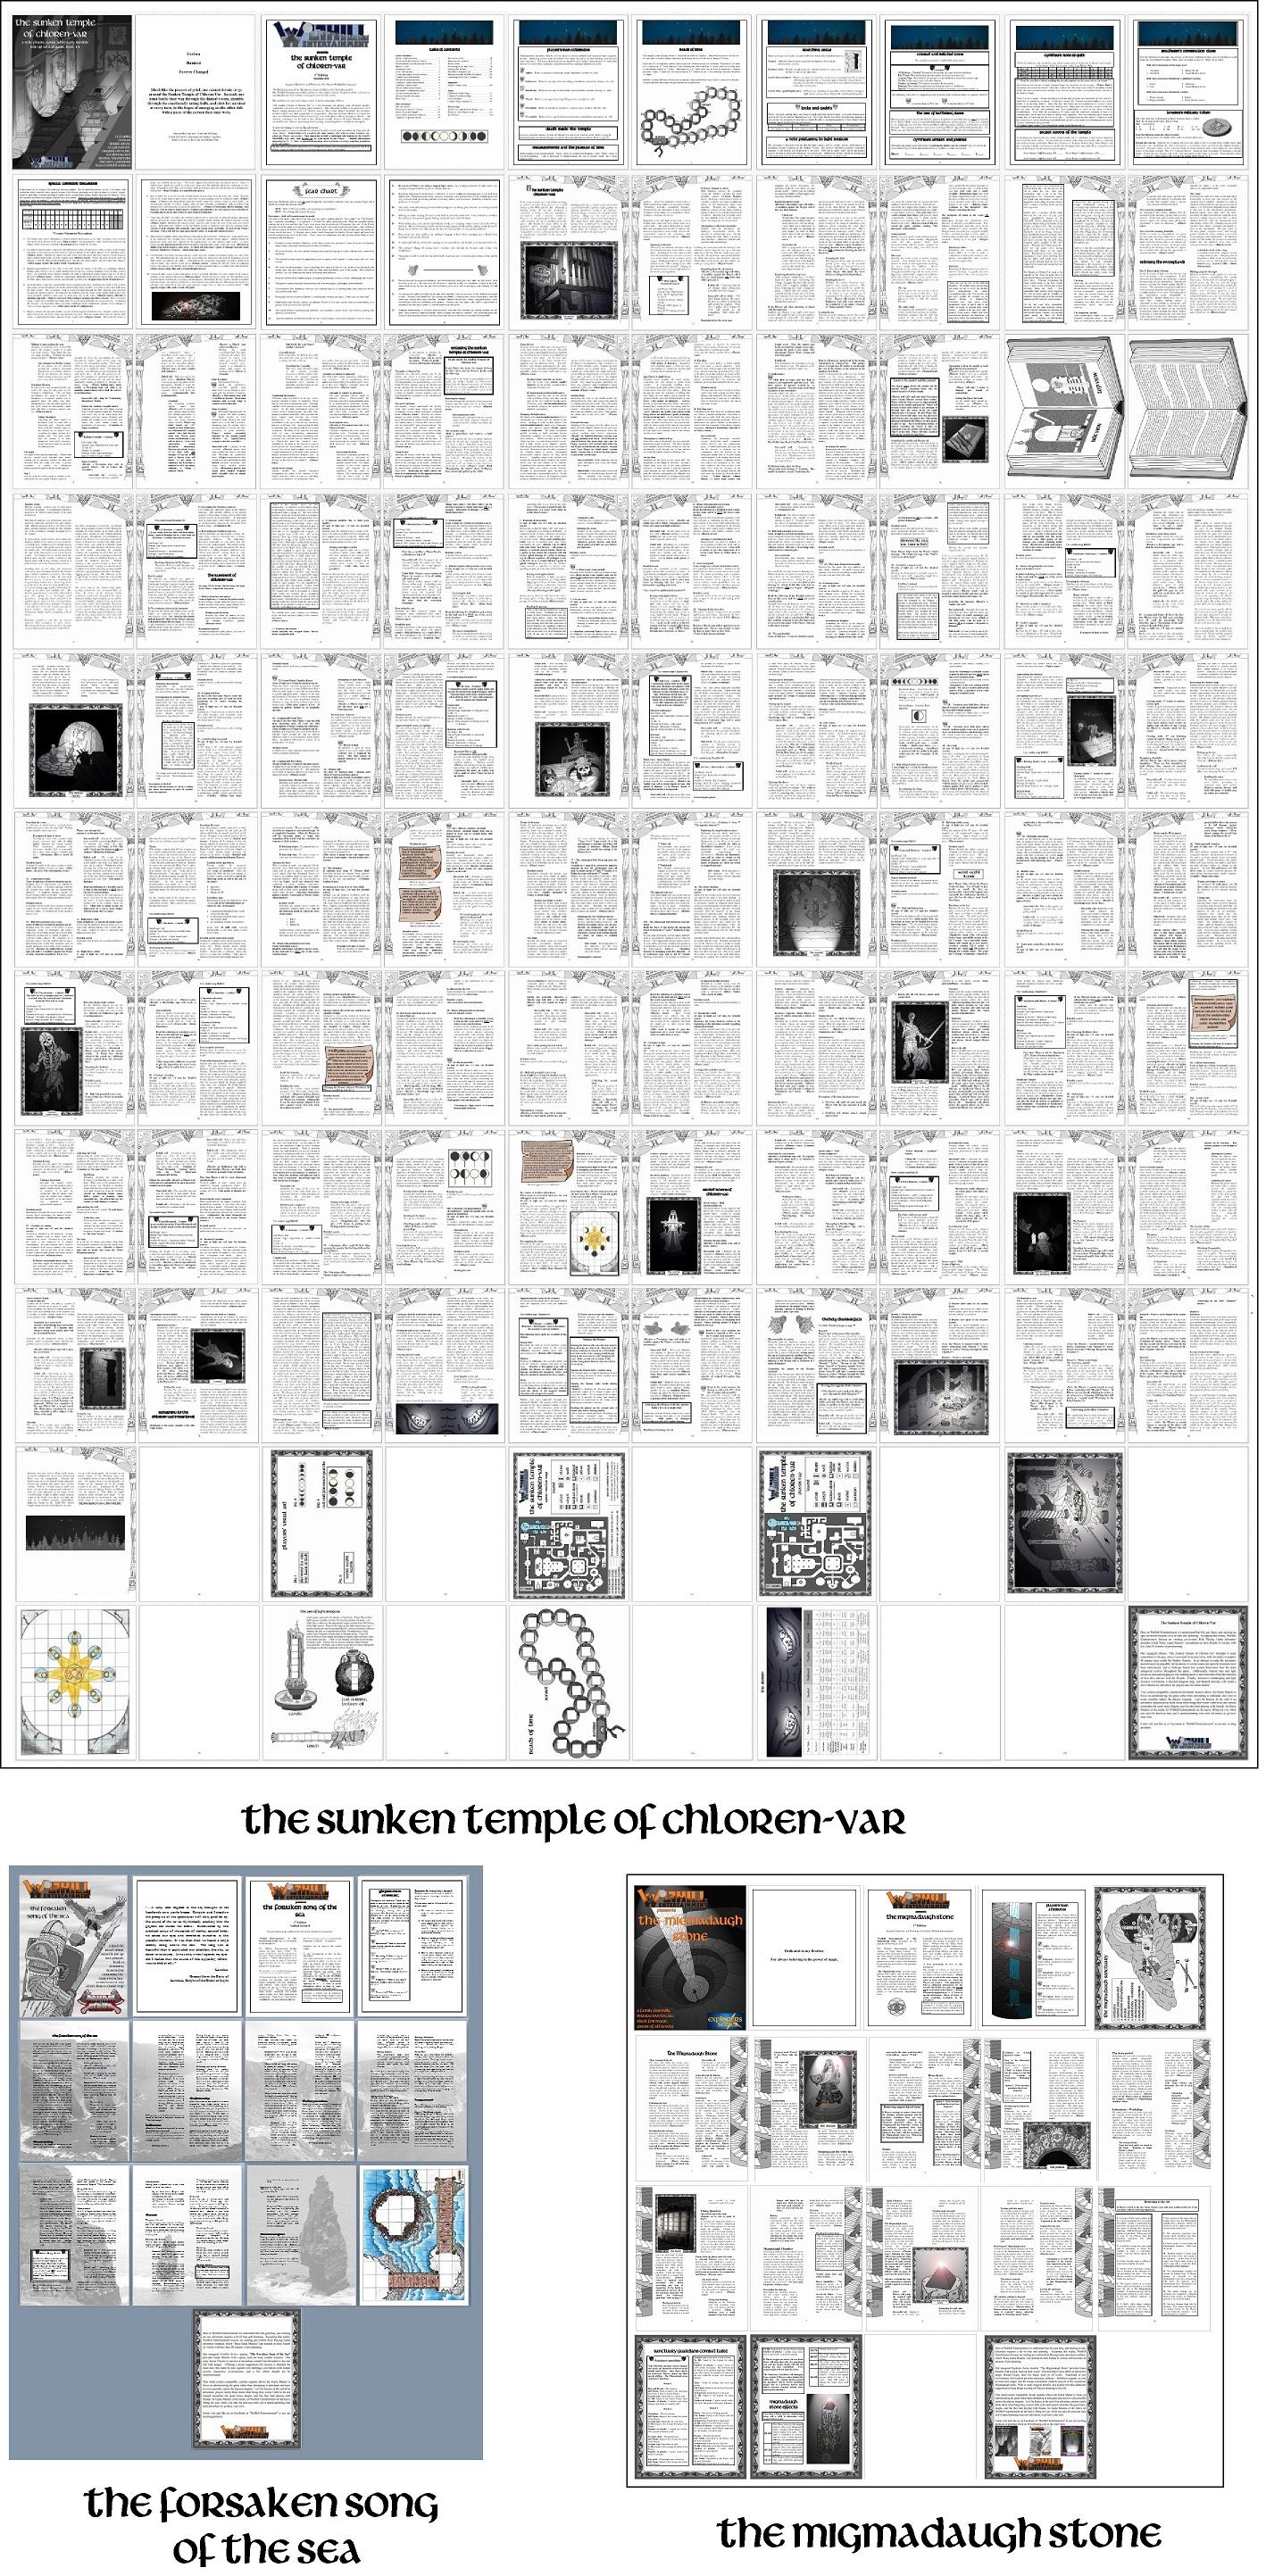 000000 - Overview - Copy - 2 - Copy.jpg